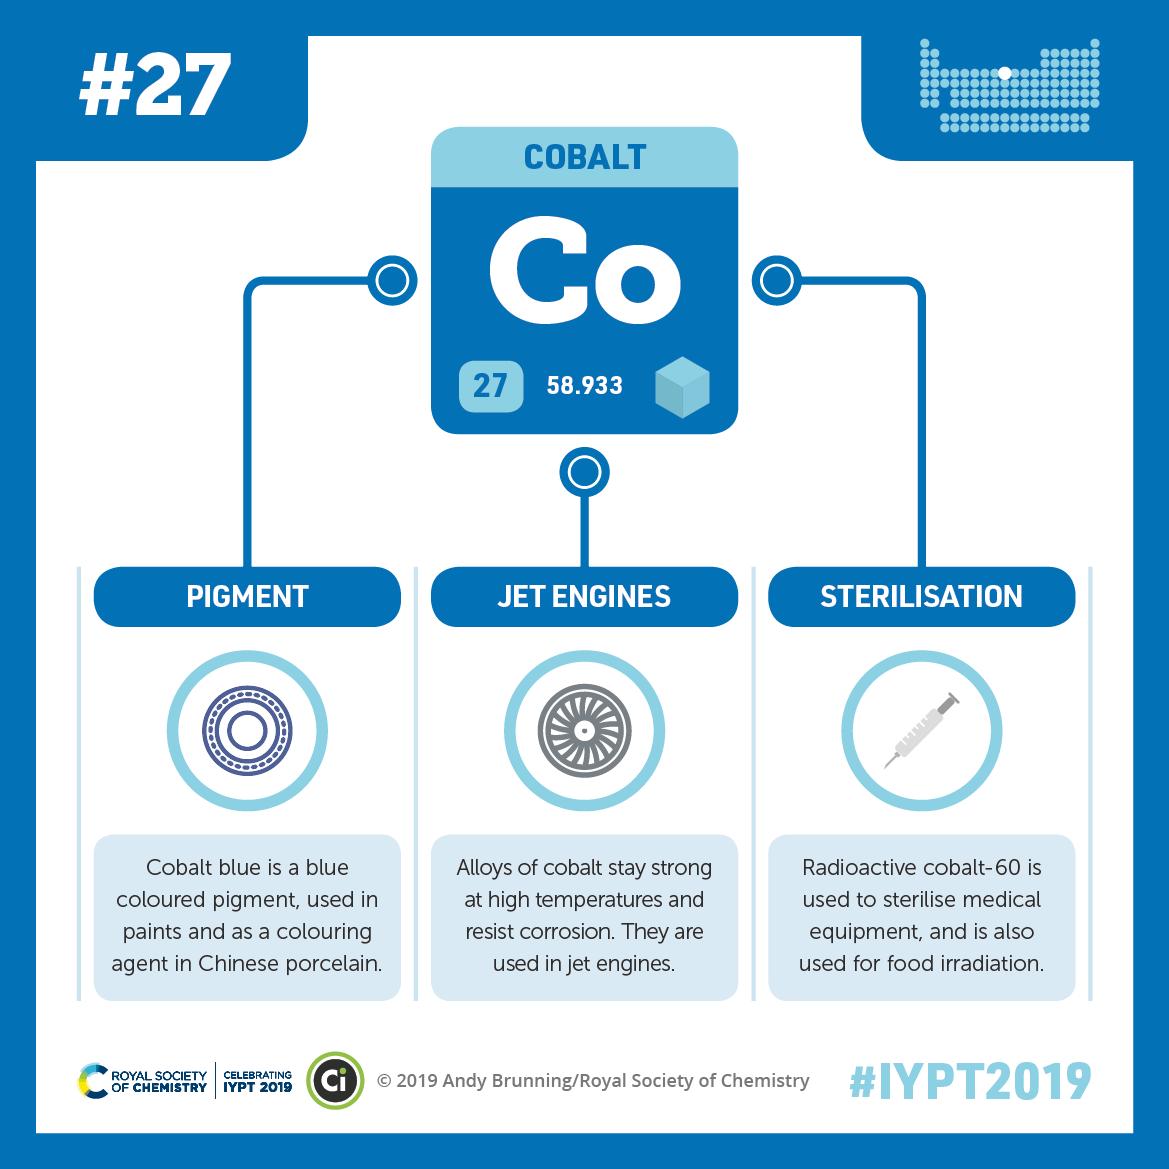 IYPT 2019 Elements 027: Cobalt: Pigments, jet engines, and sterilisation